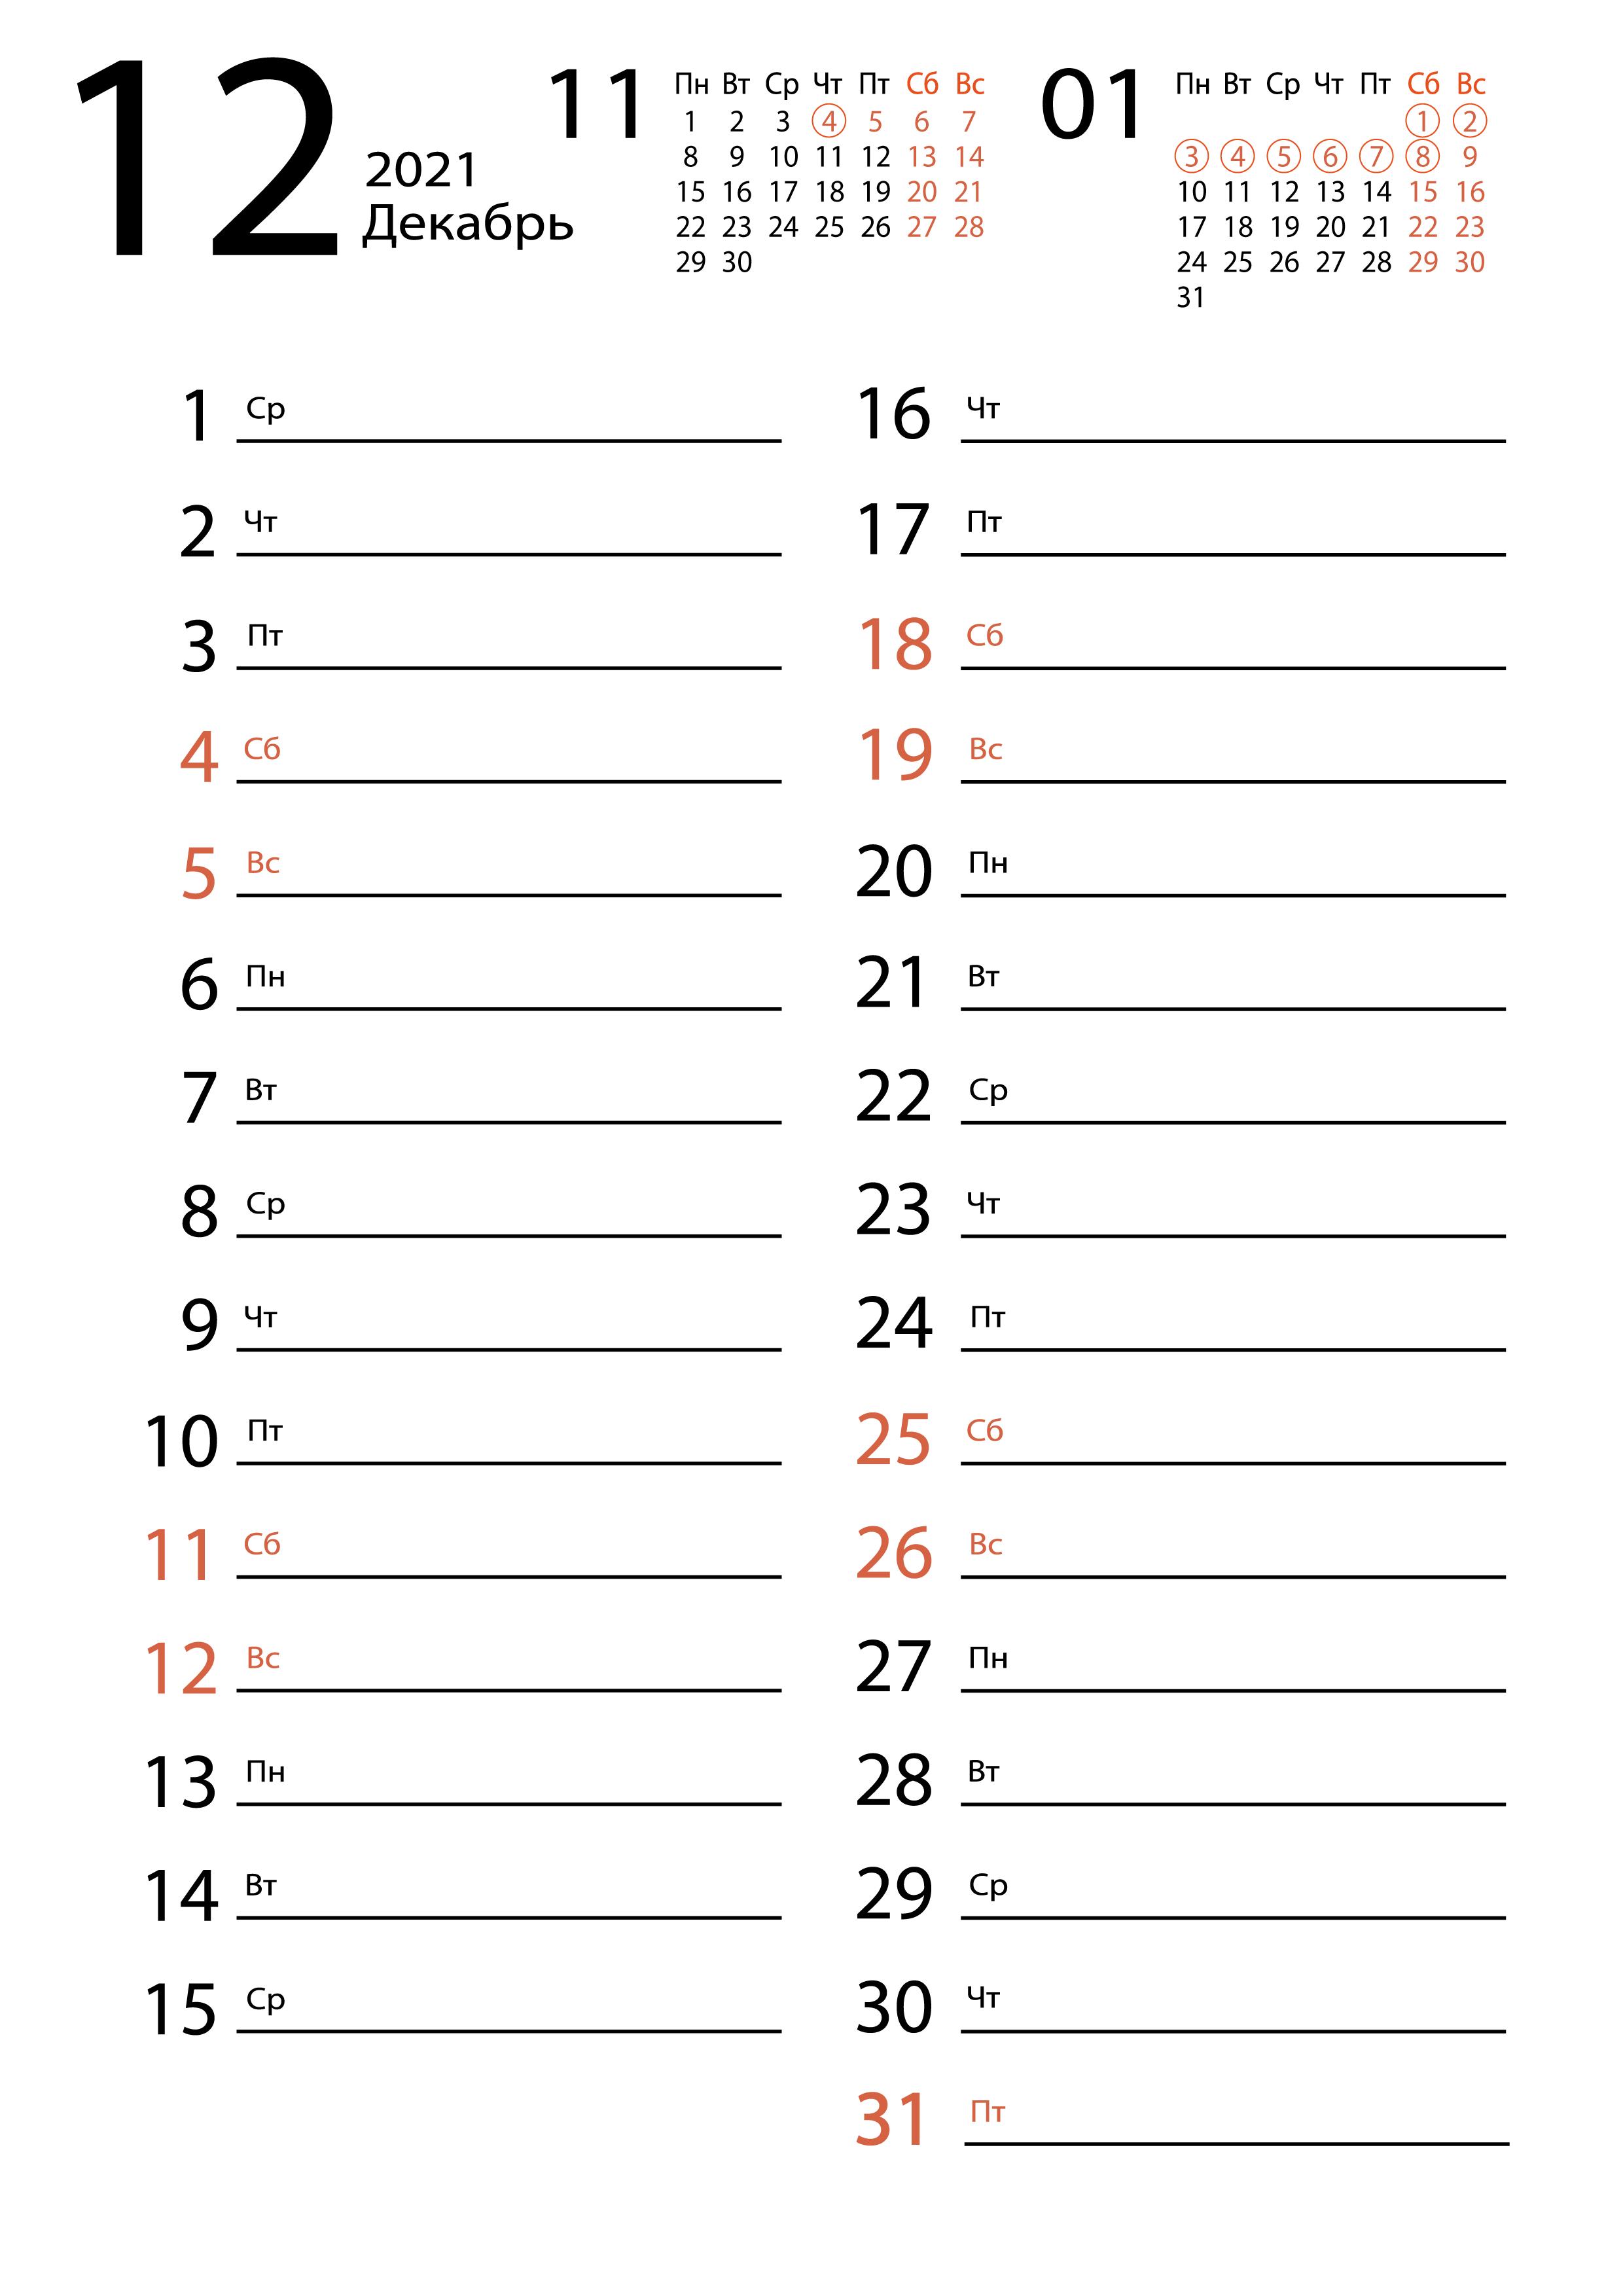 Календарь для заметок на Декабрь 2021 года